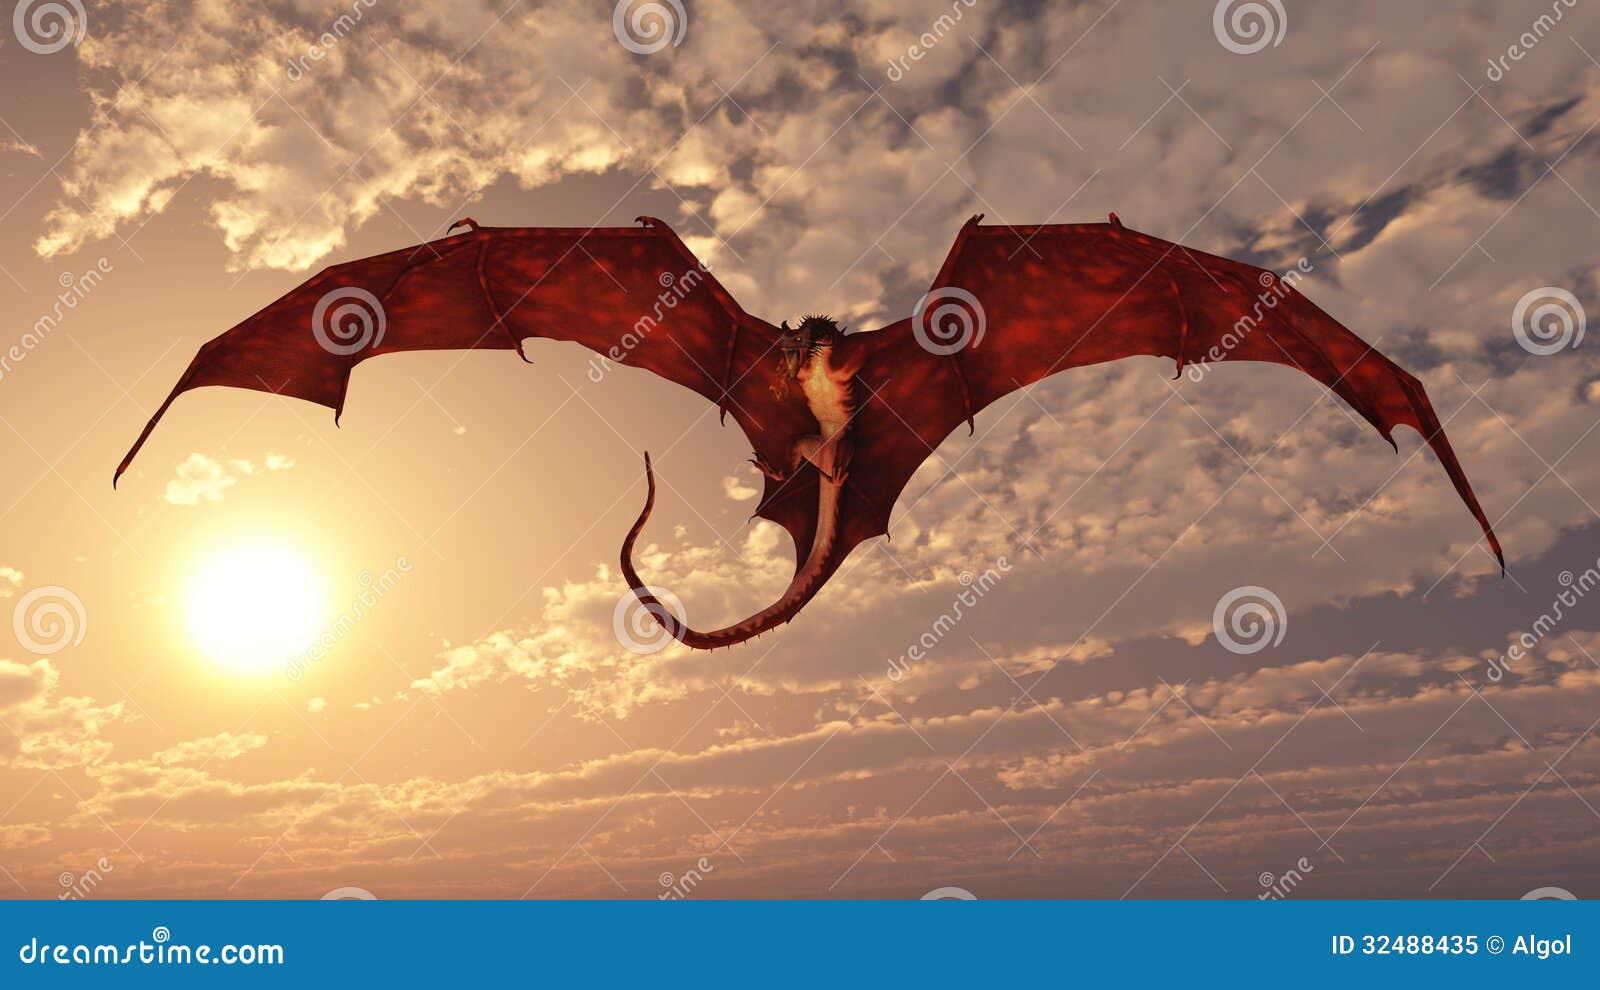 Flying the Dragon  Kindle edition by Natalie Dias Lorenzi